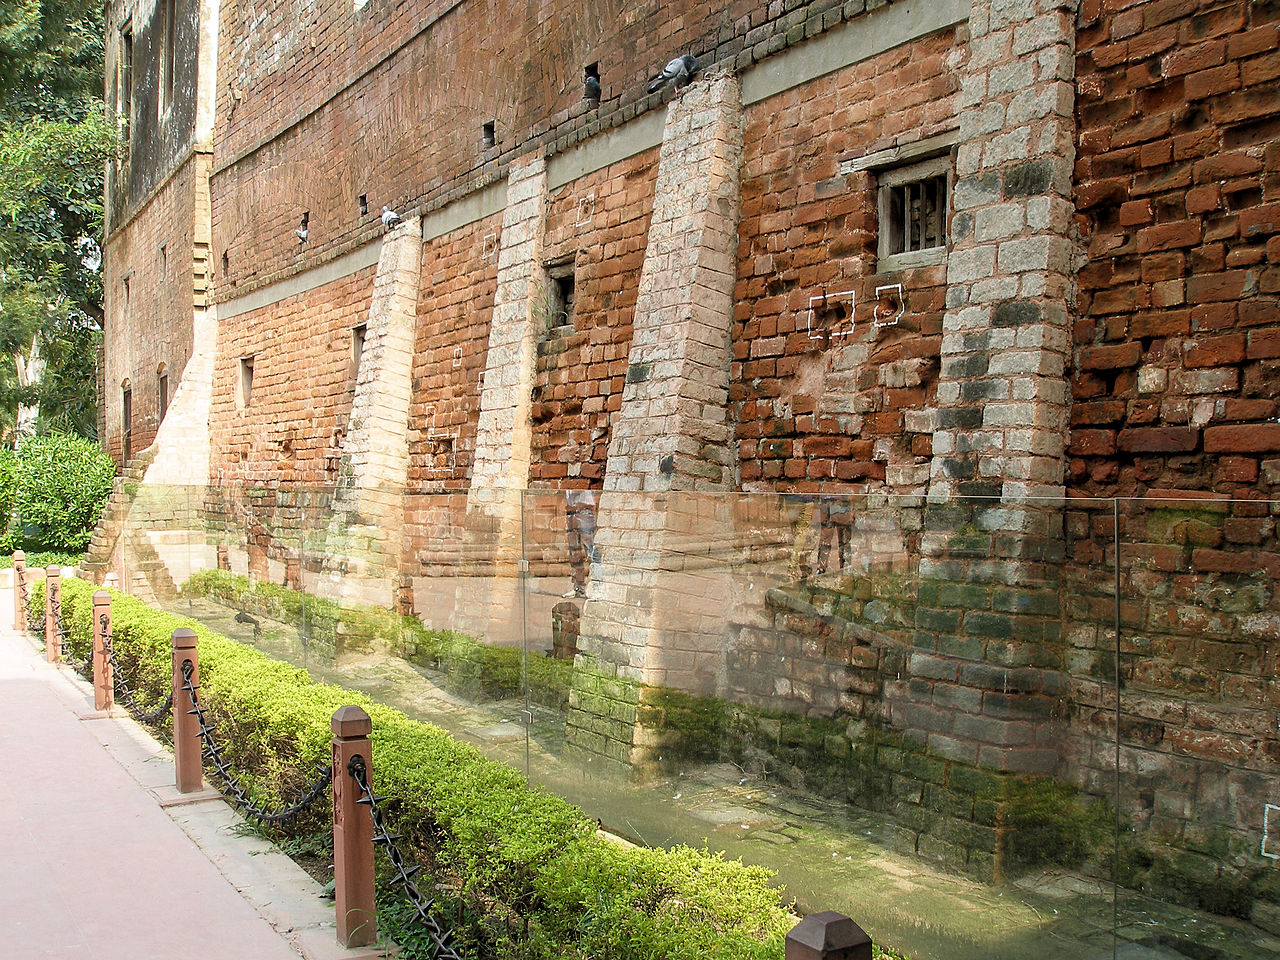 amritsar massacre summary